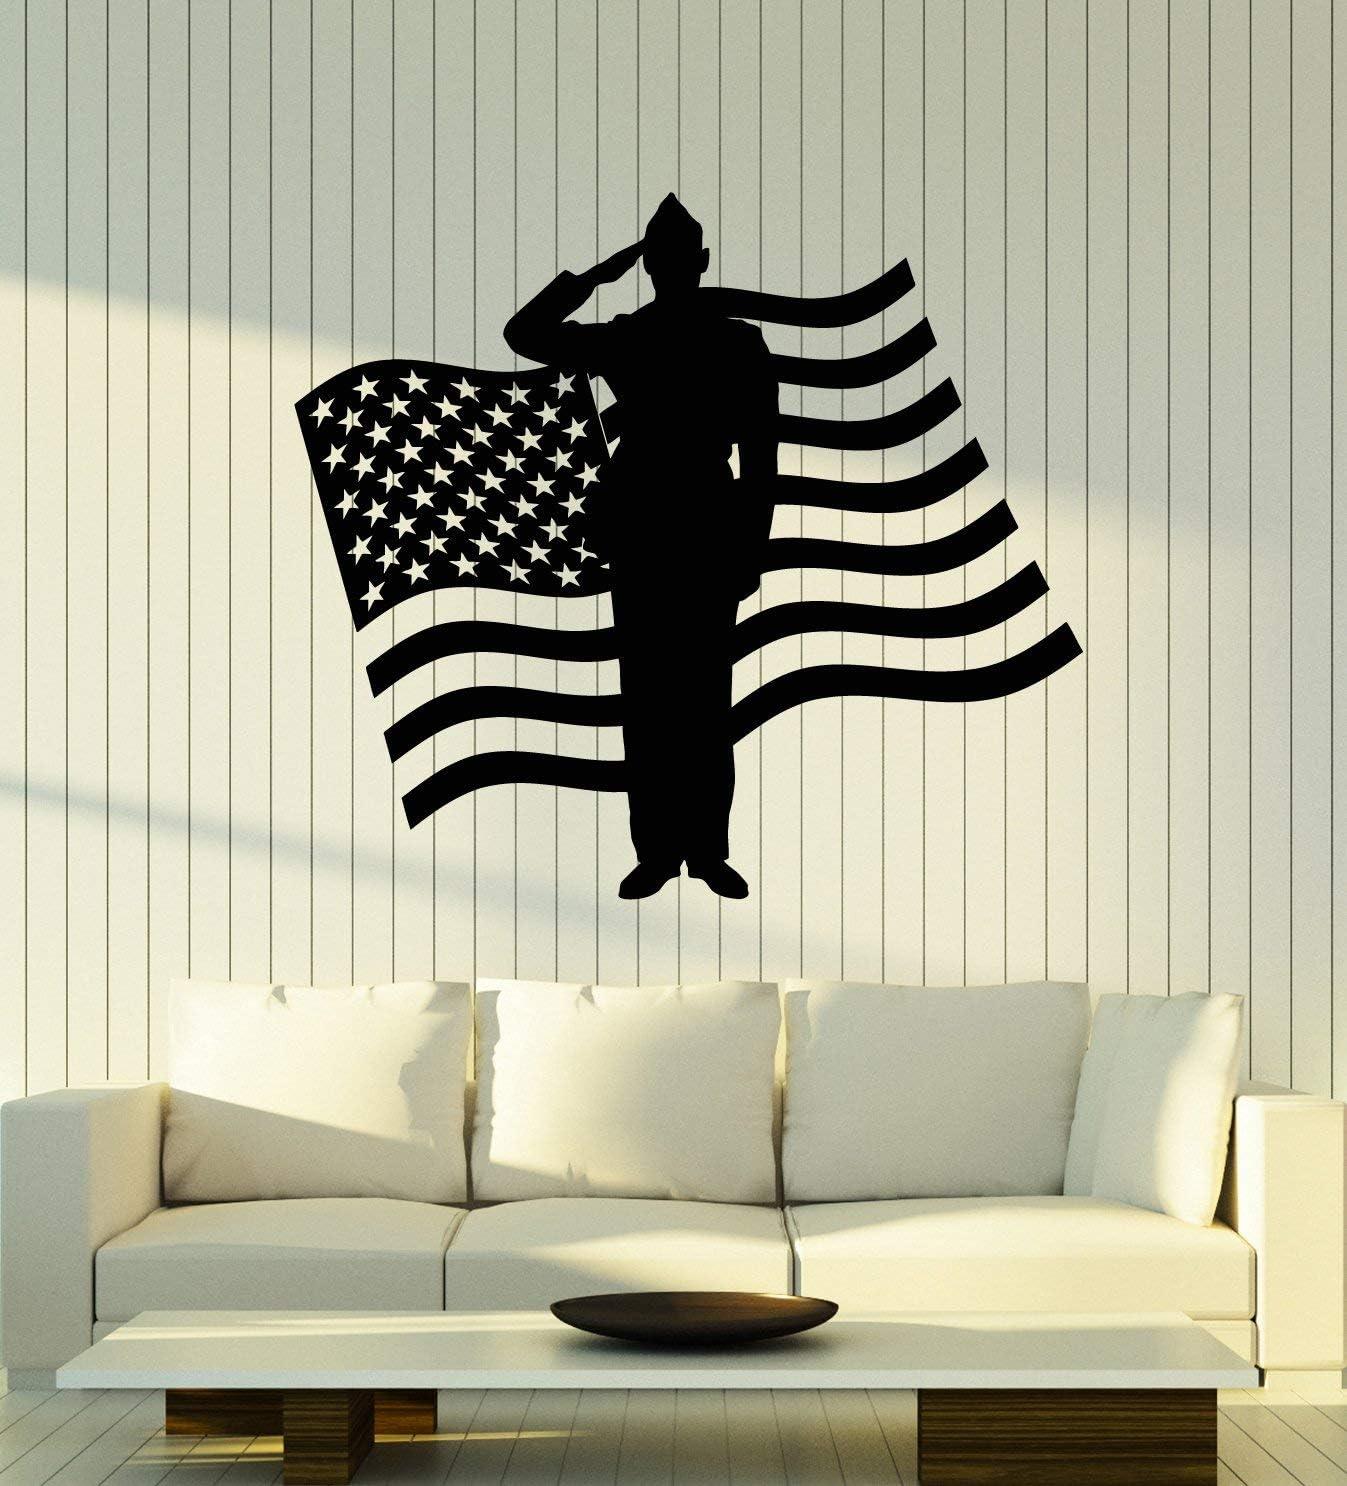 Vinyl キャンペーンもお見逃しなく Wall Decal 永遠の定番 American Flag Soldier Military Patriotic Art St